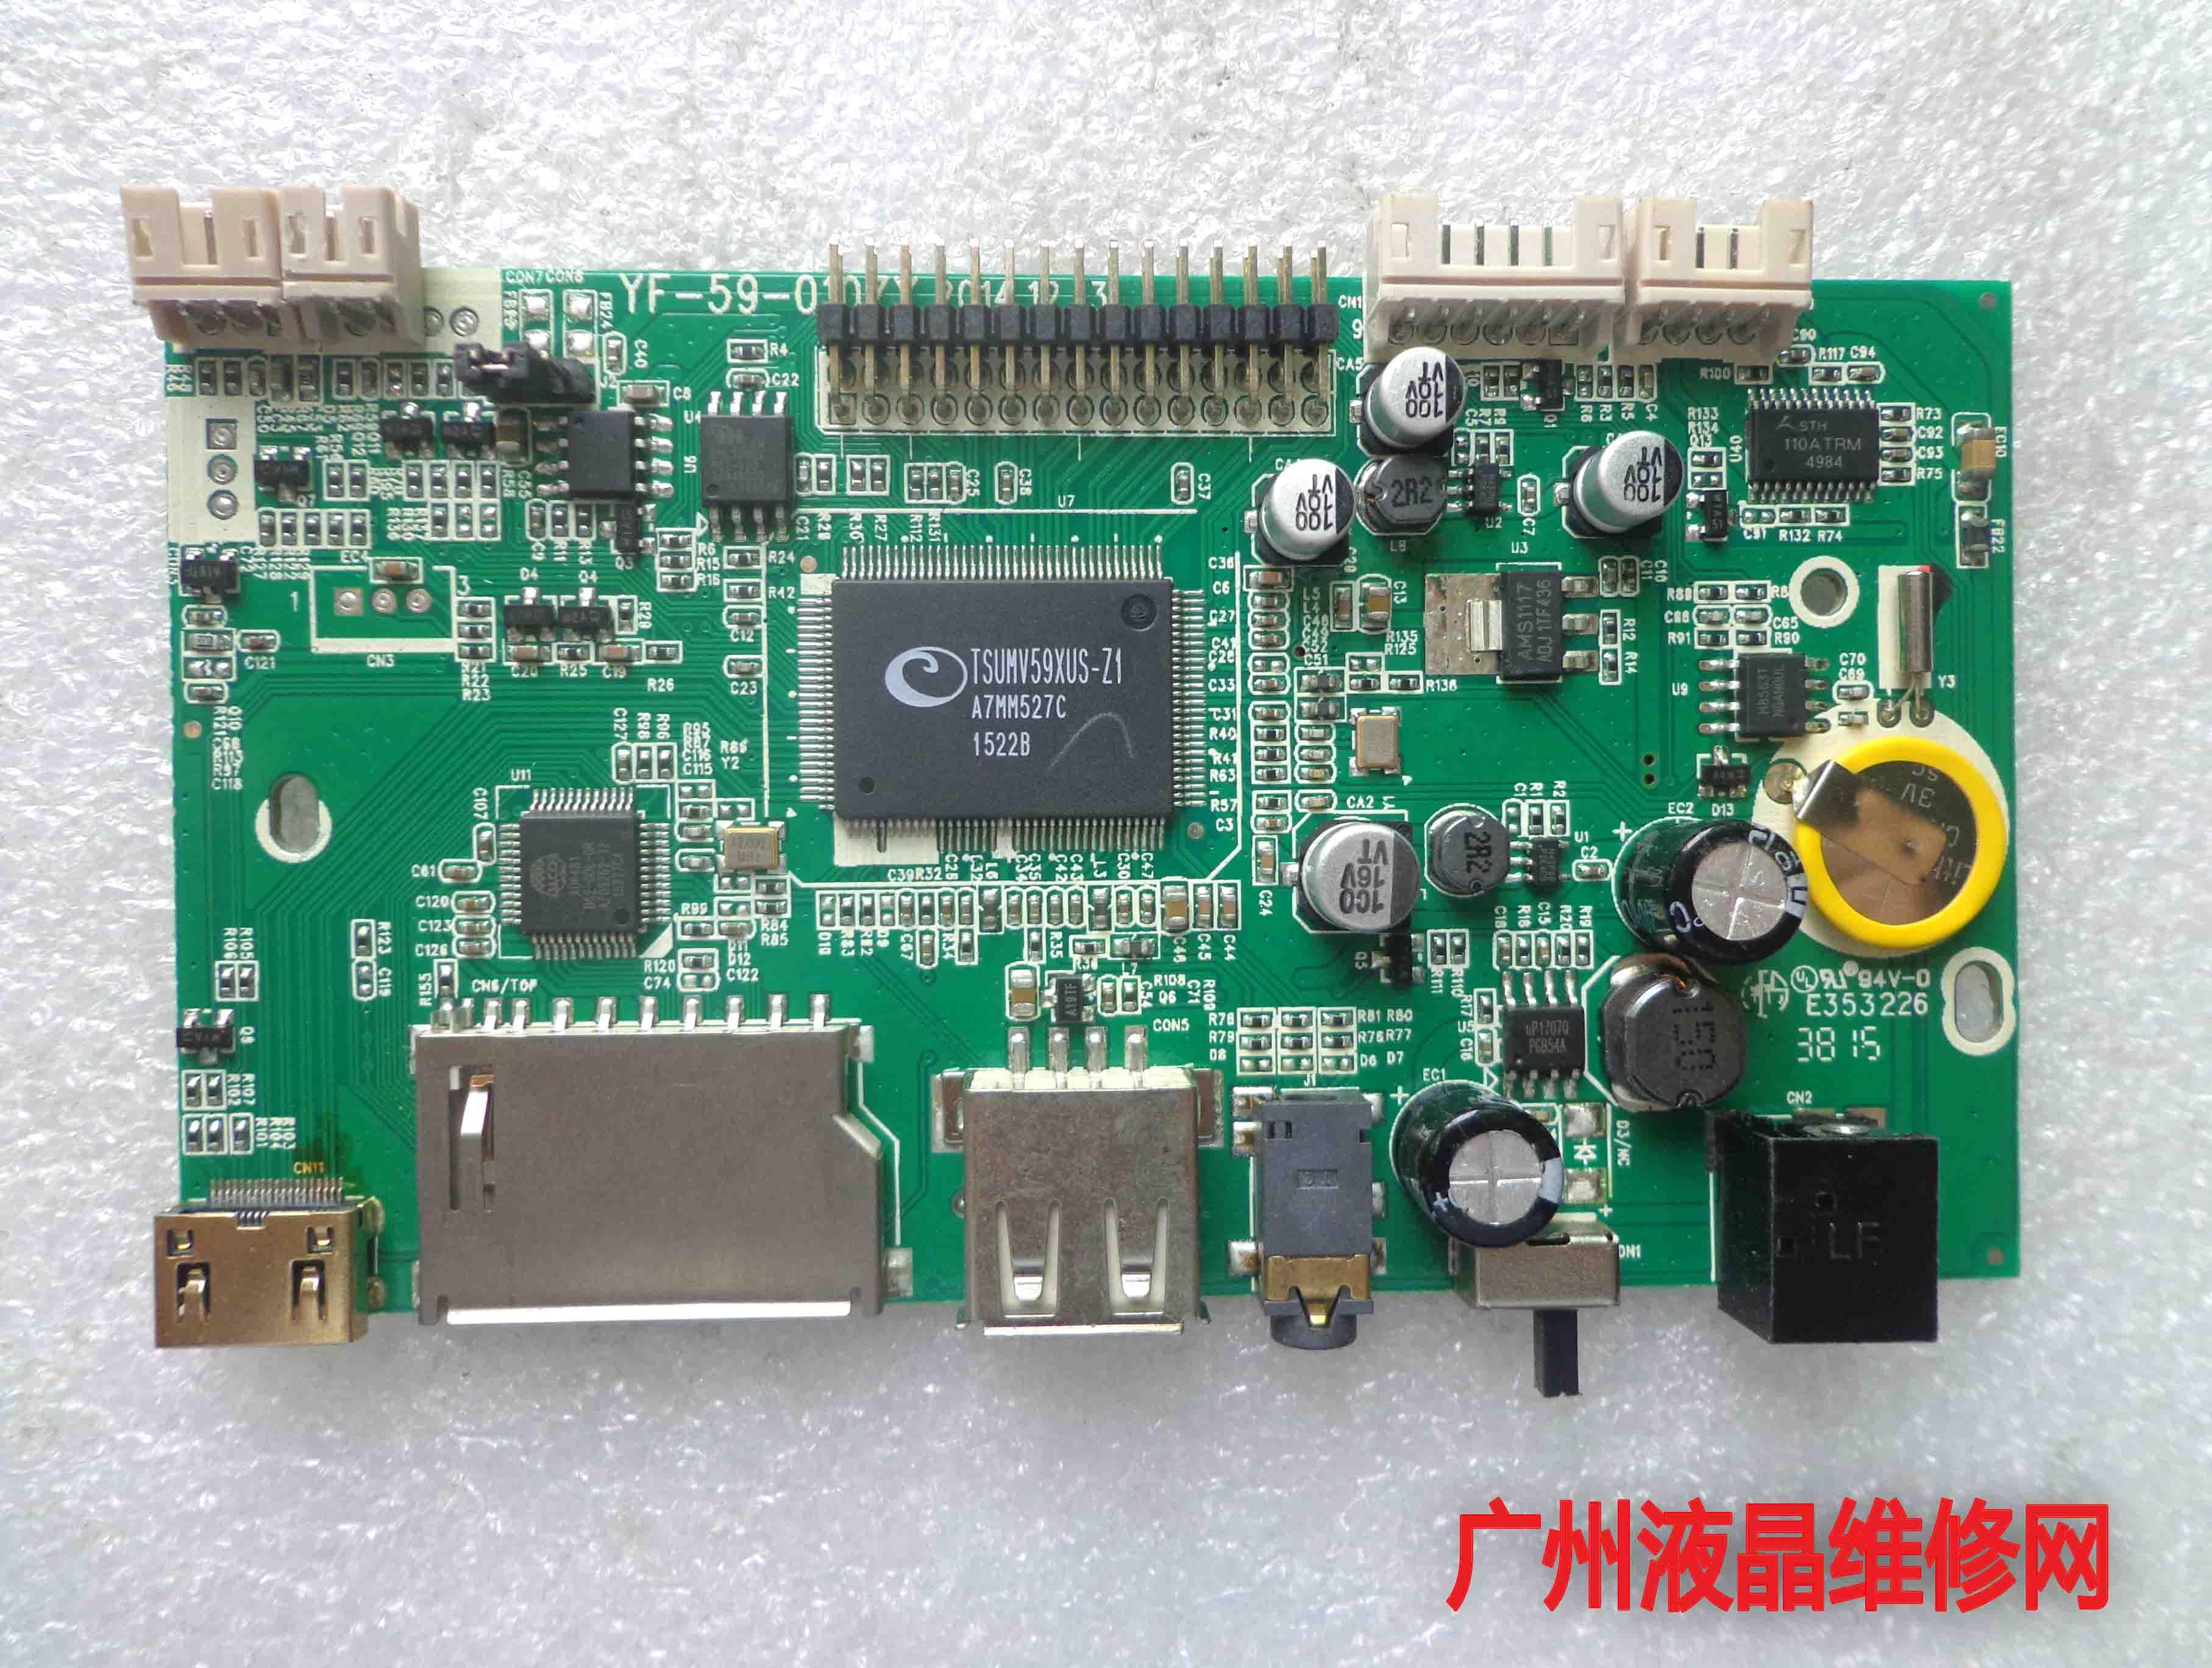 Original Disassemble Advertising Machine Game Drive Adapter Plate YF-59-010ZY E353226 1366 * 768